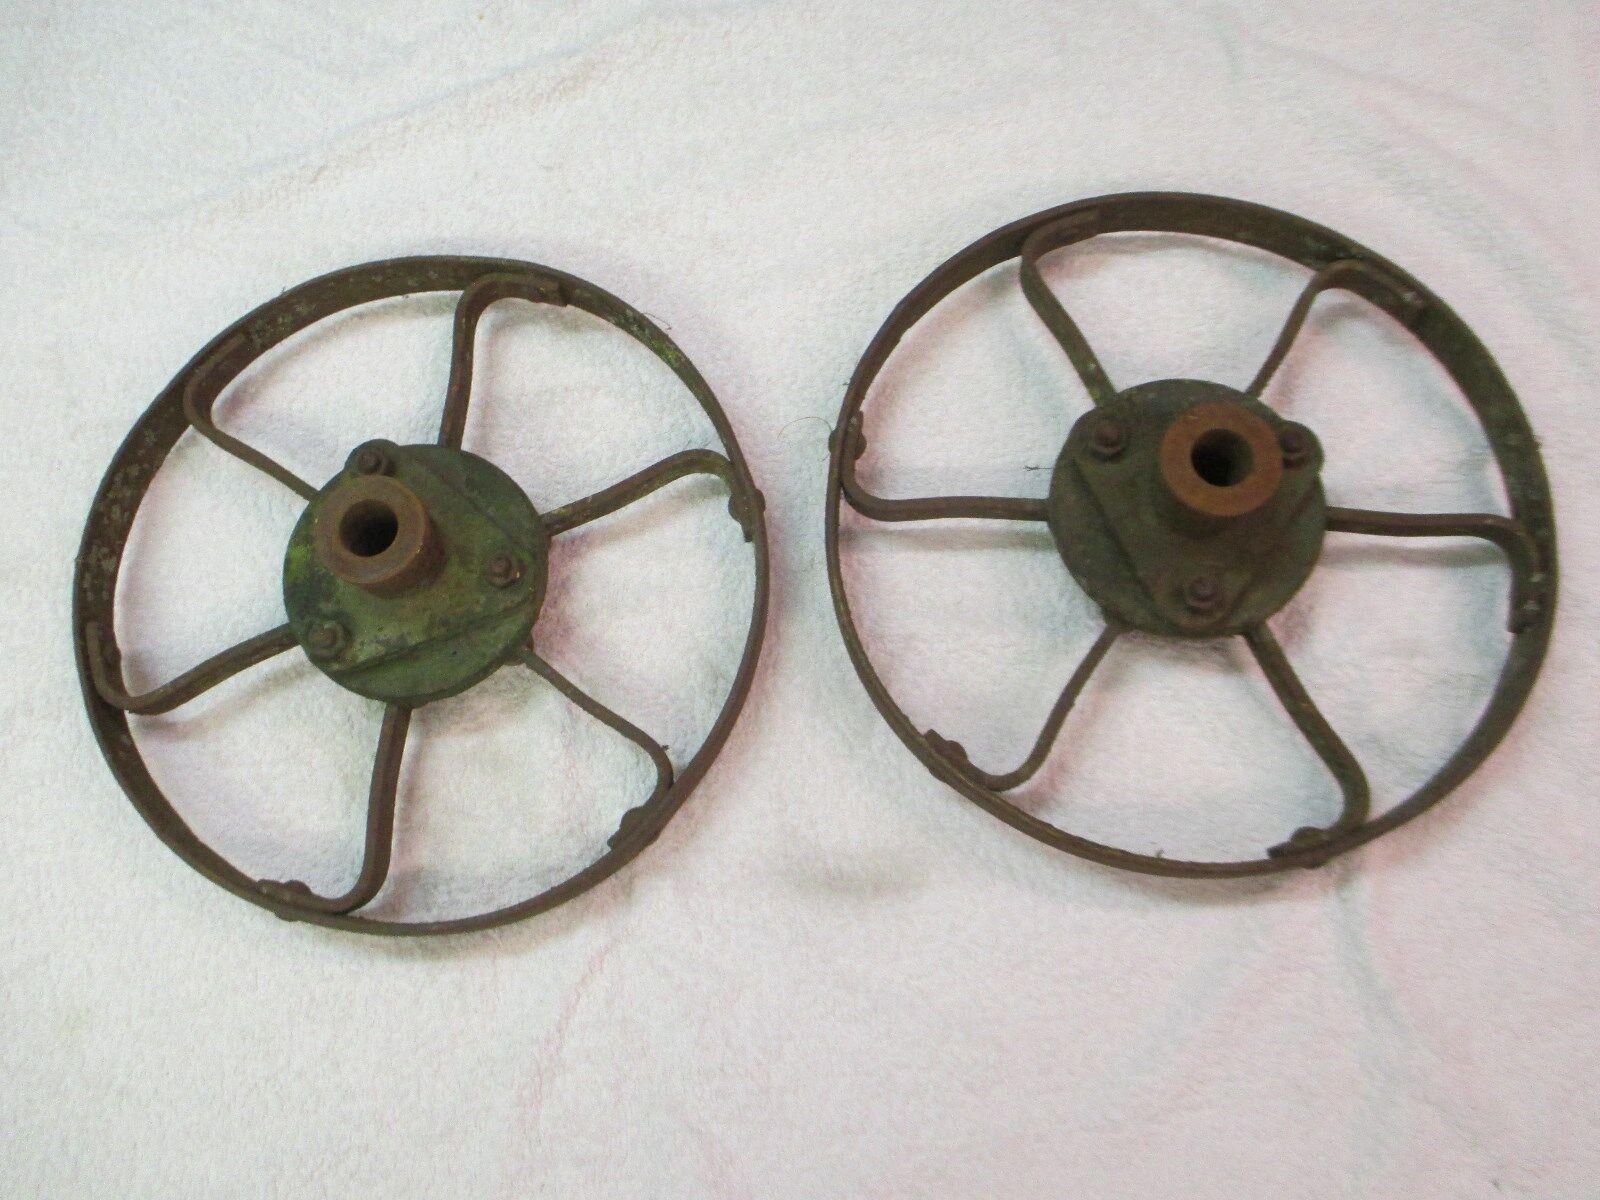 Metallrad Eisenrad Gussrad Antik Grill bauen Hobbyschmiede